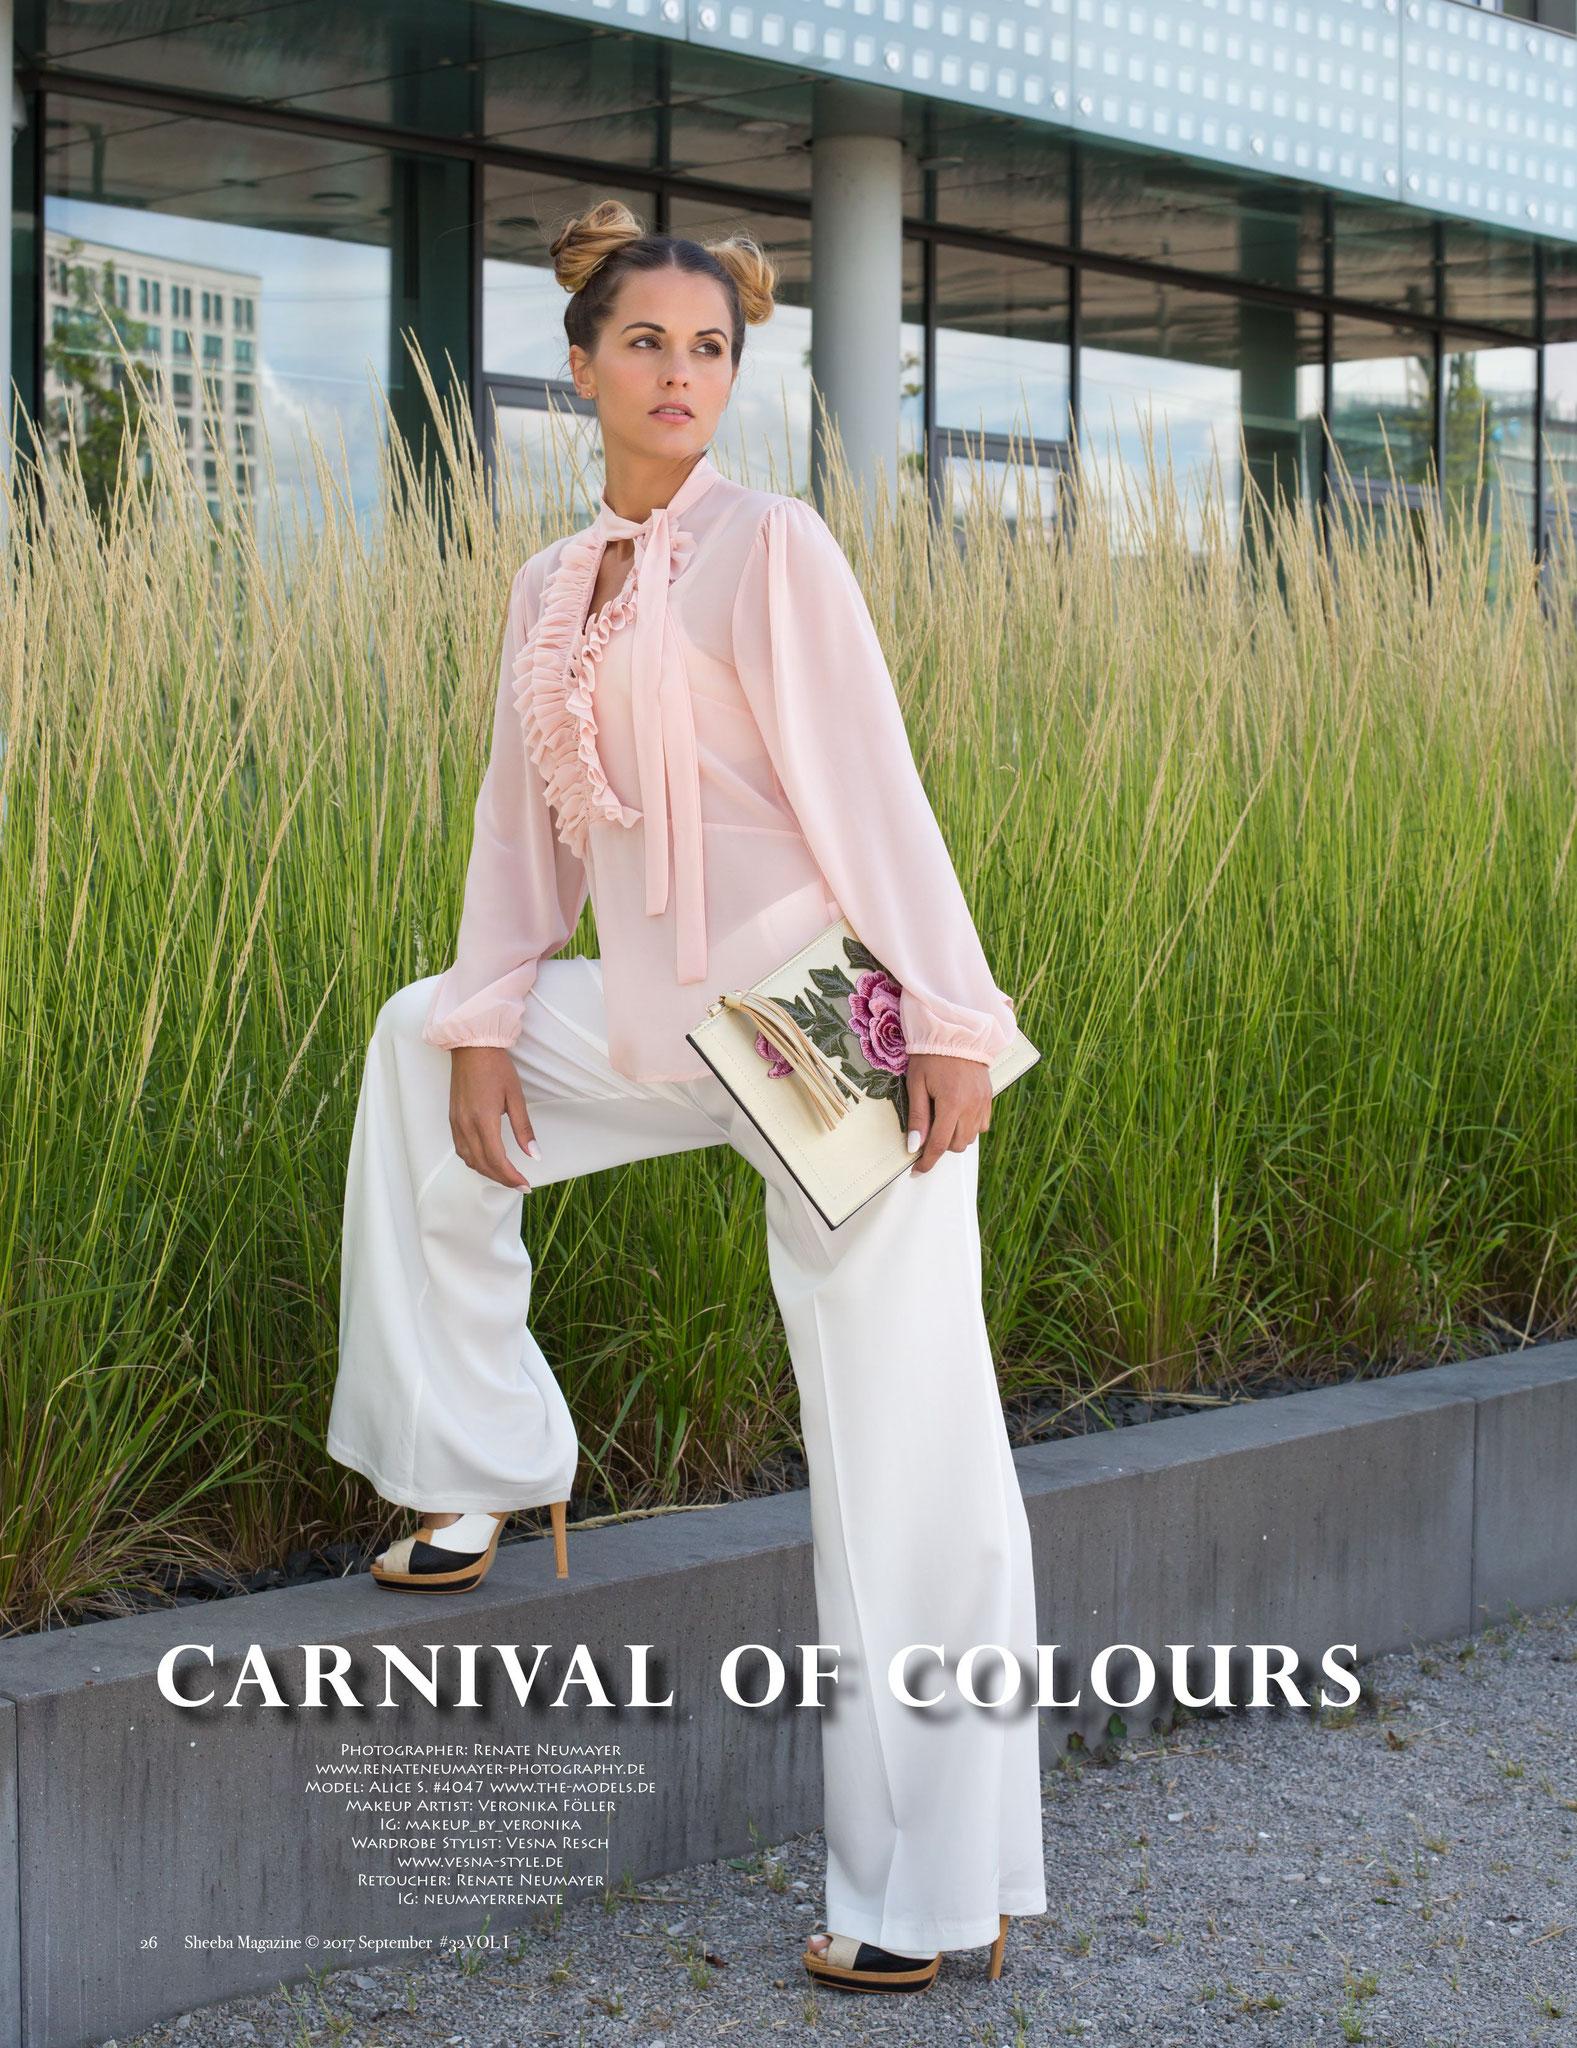 Carnival of Colours - SHEEBA UK, September 2017 VOL I